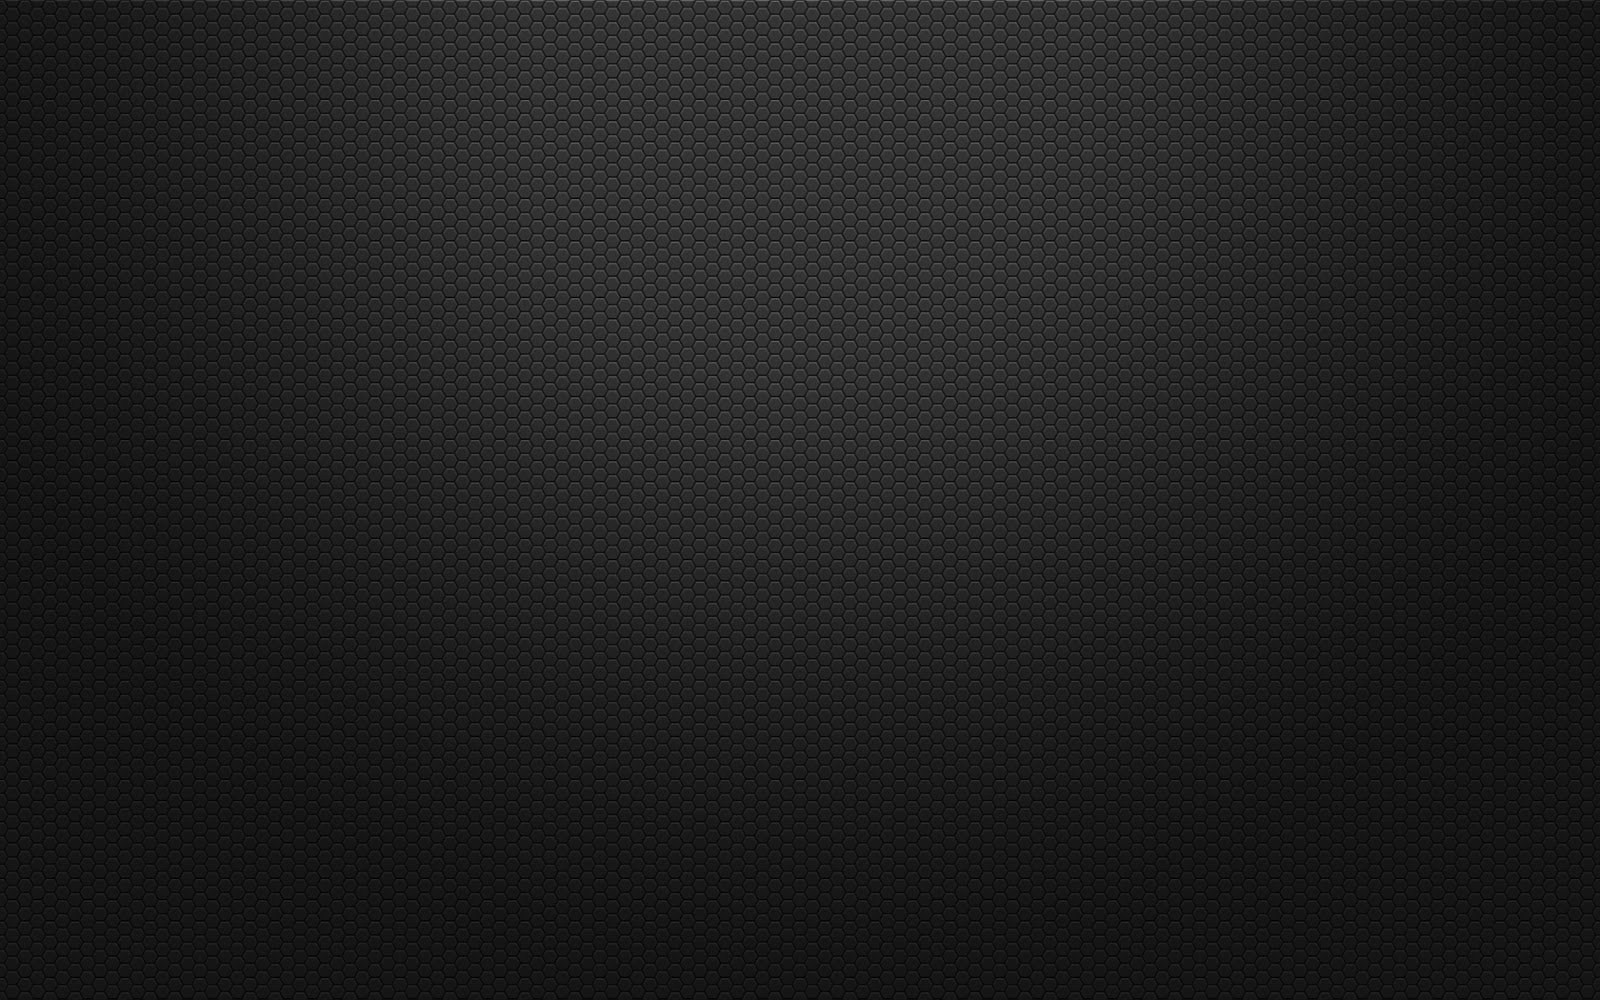 Black Wallpaper Background Download Wallpaper 1600x1000